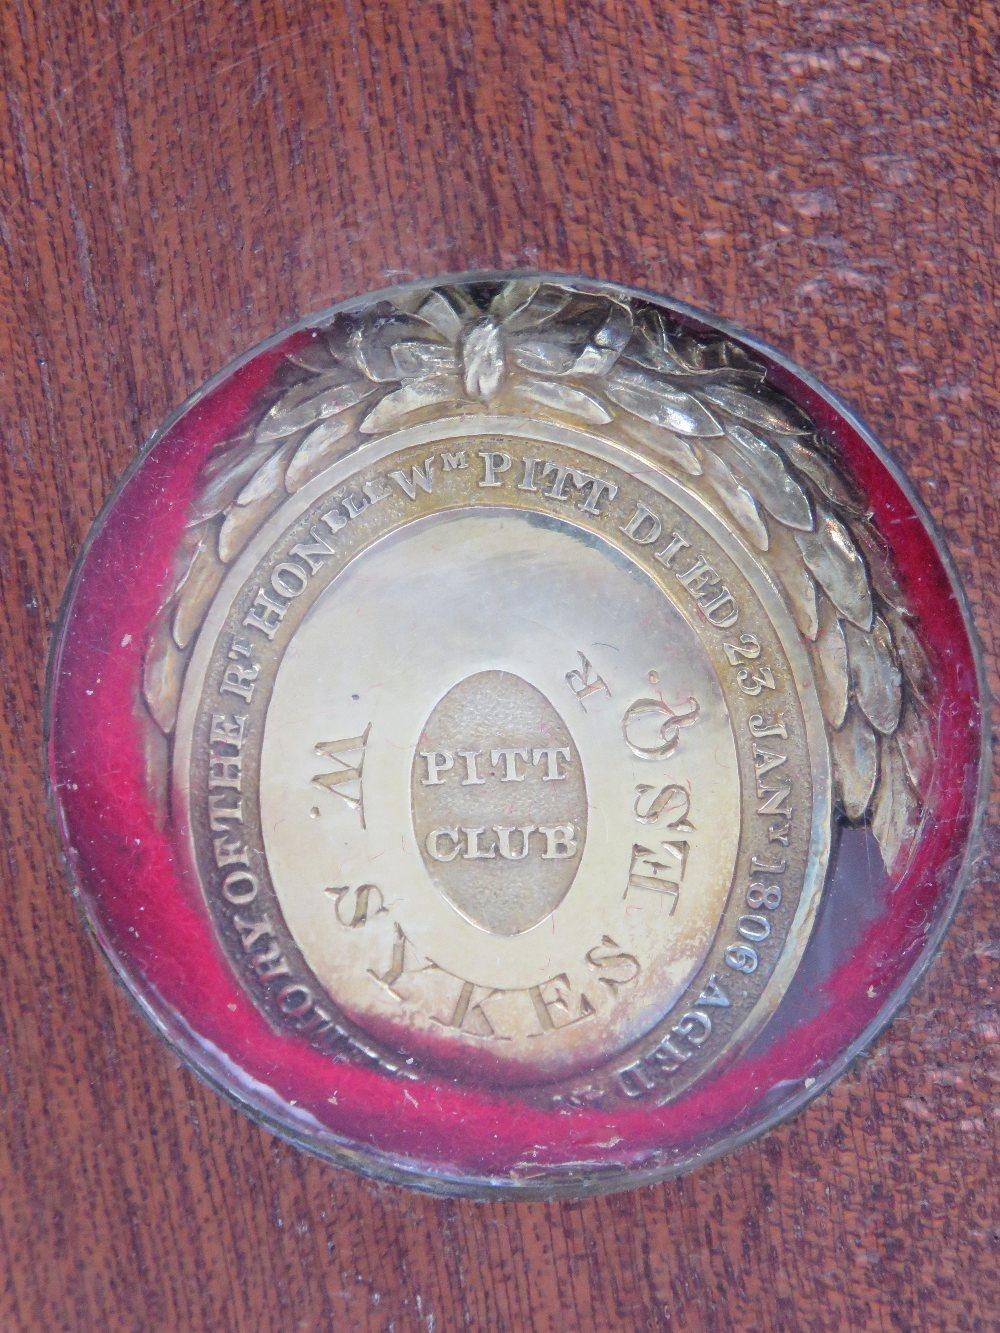 Lot 431 - A silver gilt oval Pitt Club badge,